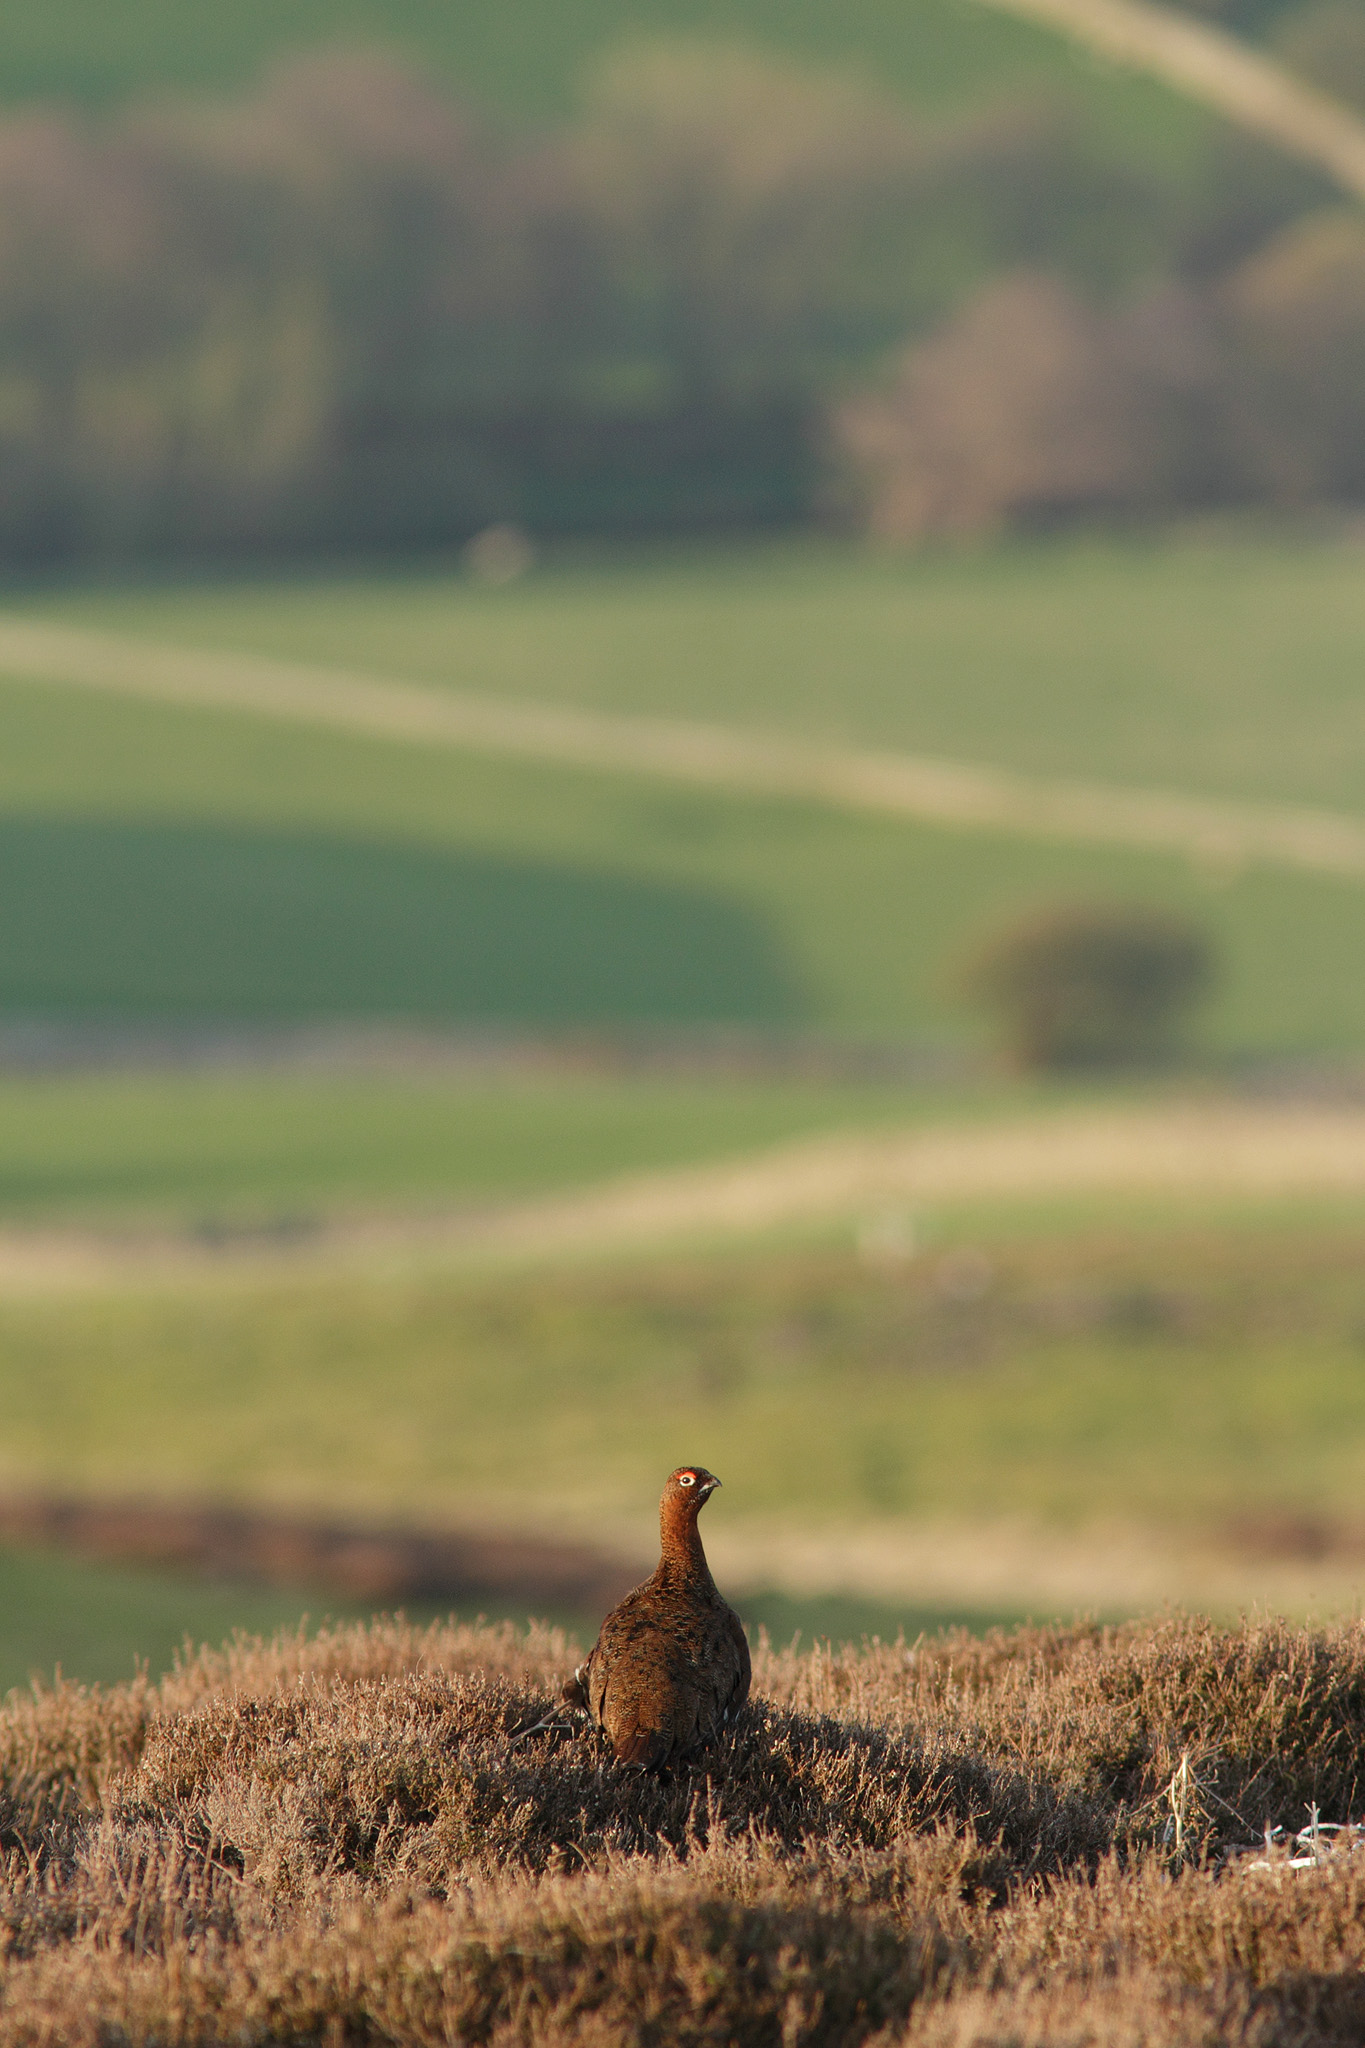 redgrouse in habitat